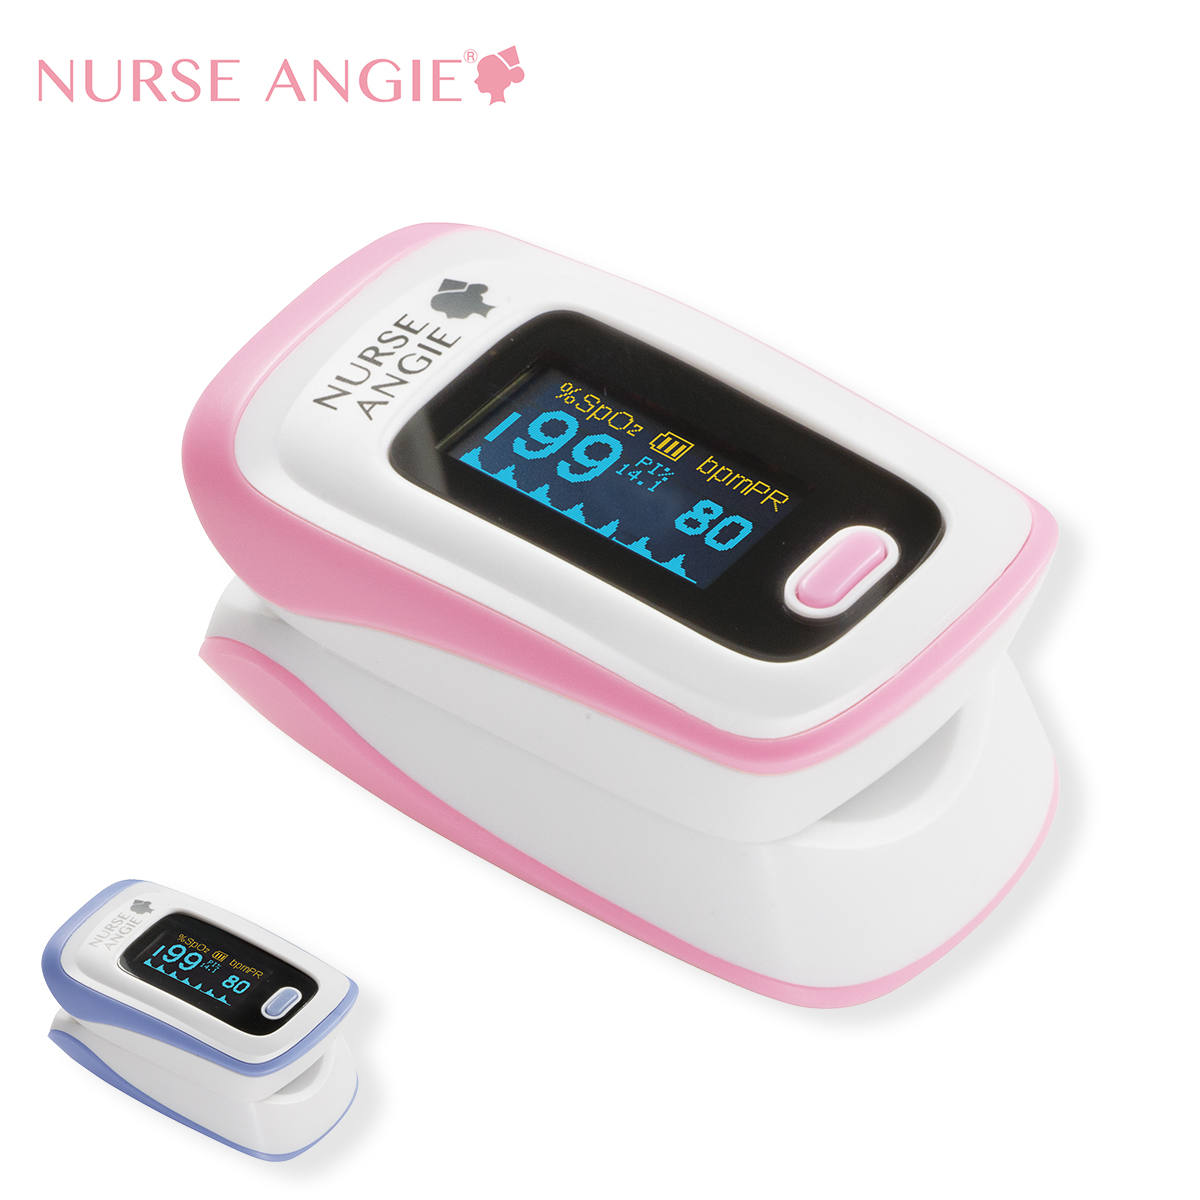 13676 NURSE ANGIE 酸素飽和度メータ【ナース 小物 グッズ 看護 医療 介護 計測】